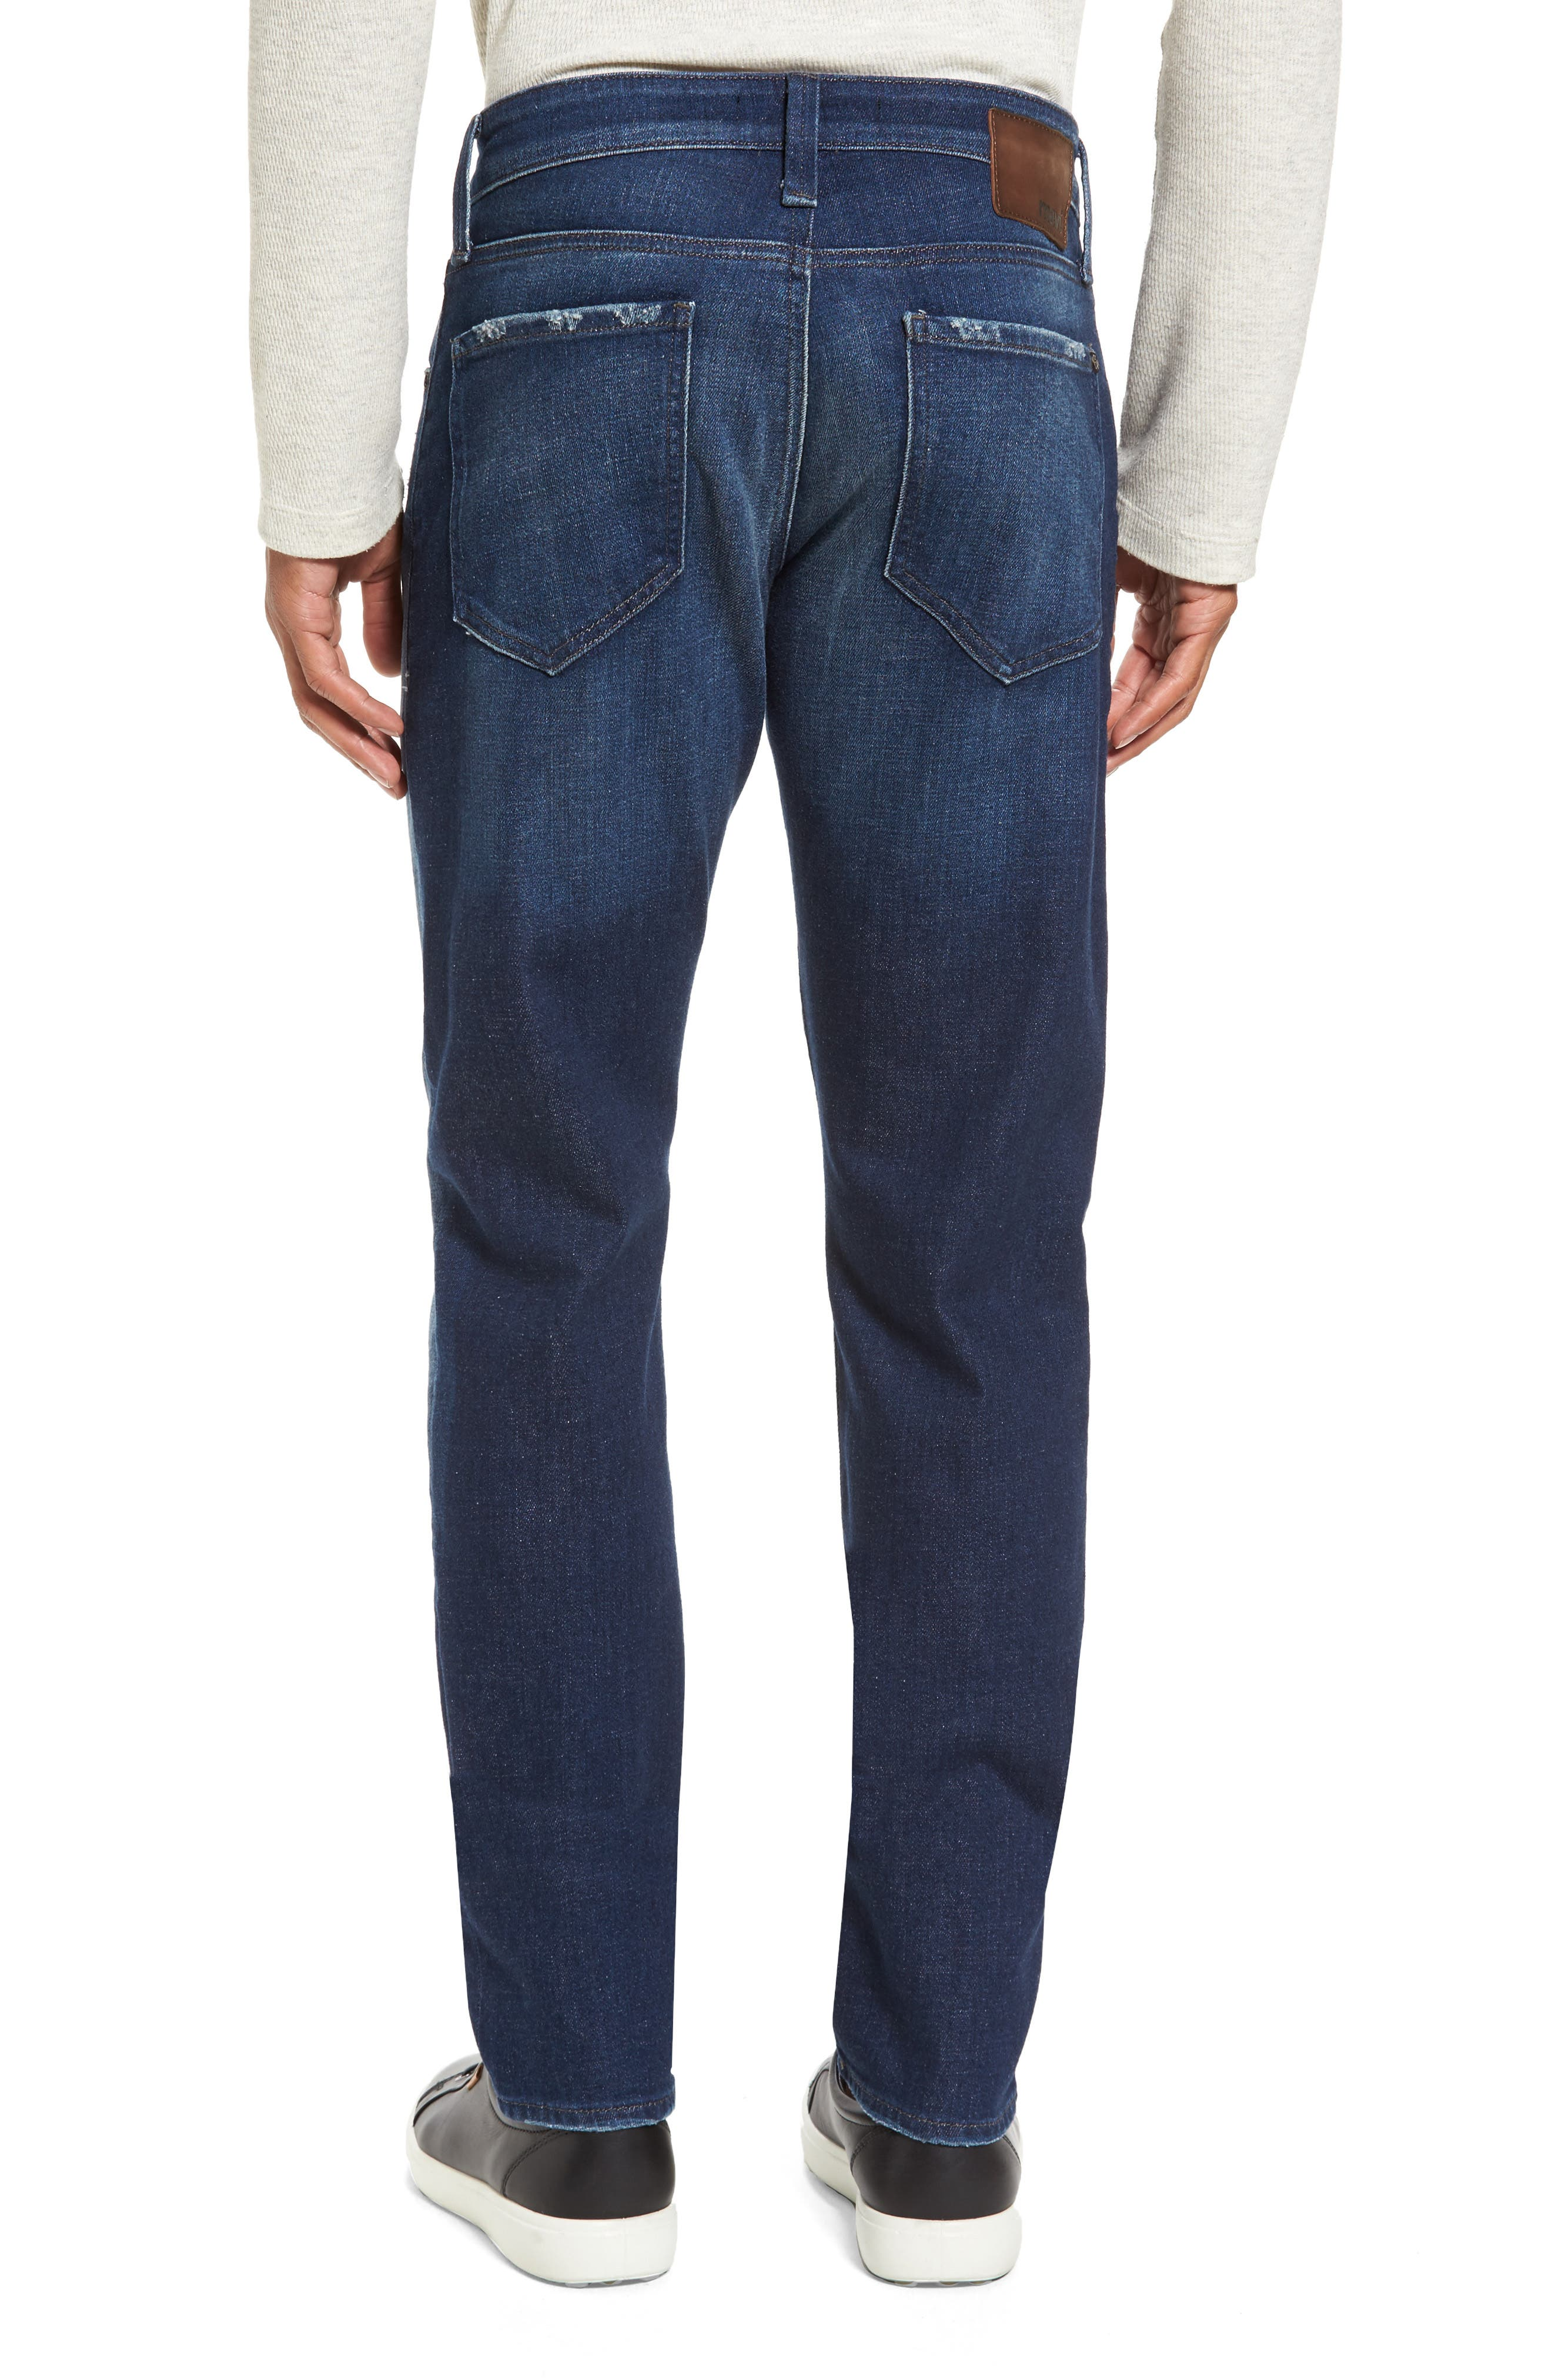 Jake Easy Slim Fit Jeans,                             Alternate thumbnail 2, color,                             401